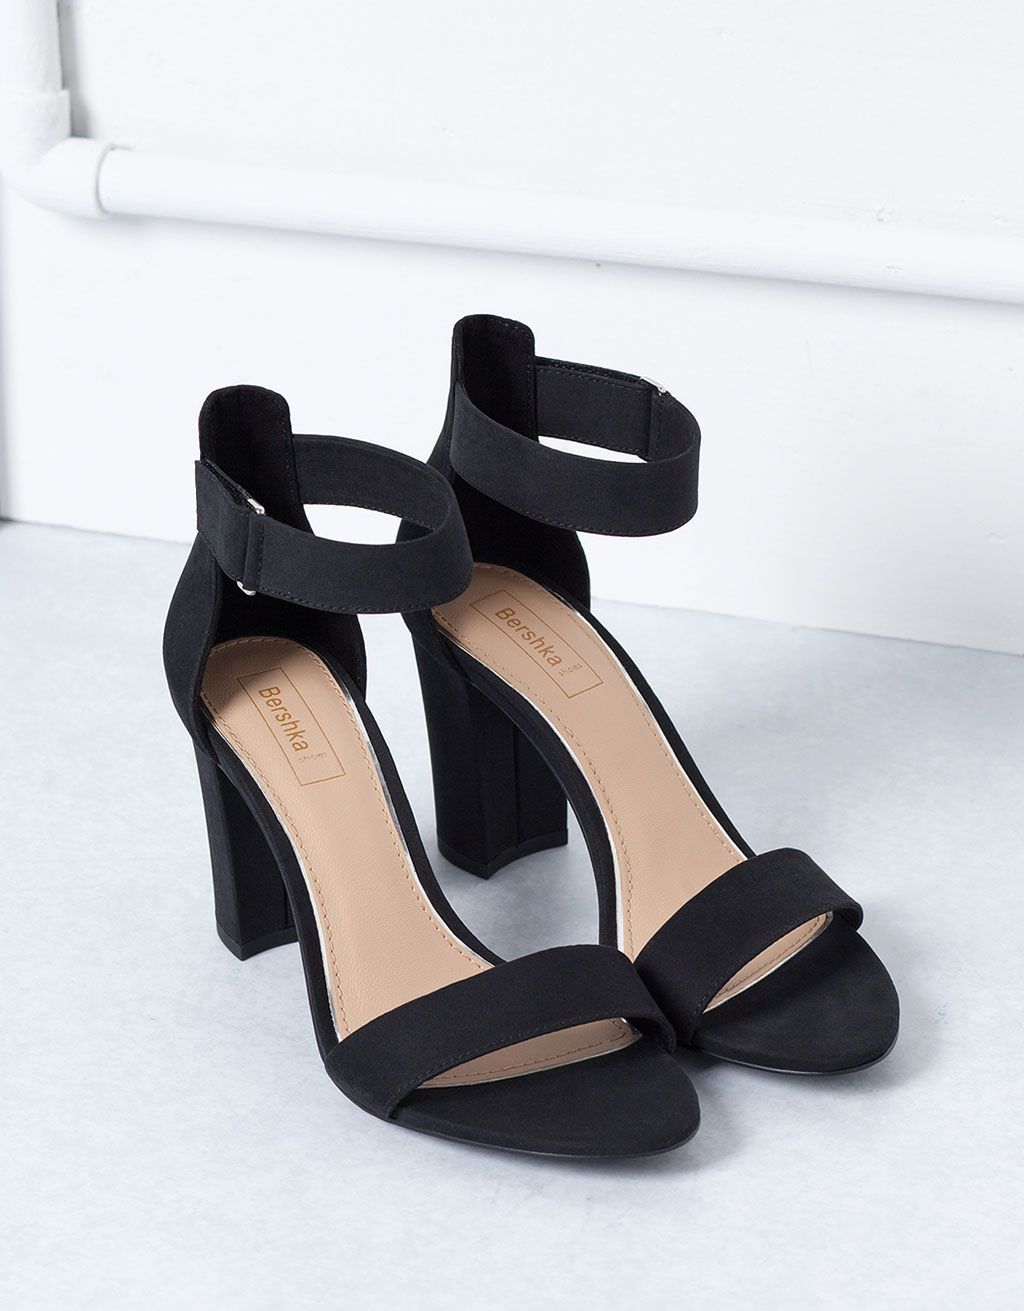 sandales à talons imprimées bershka - voir tout - bershka france